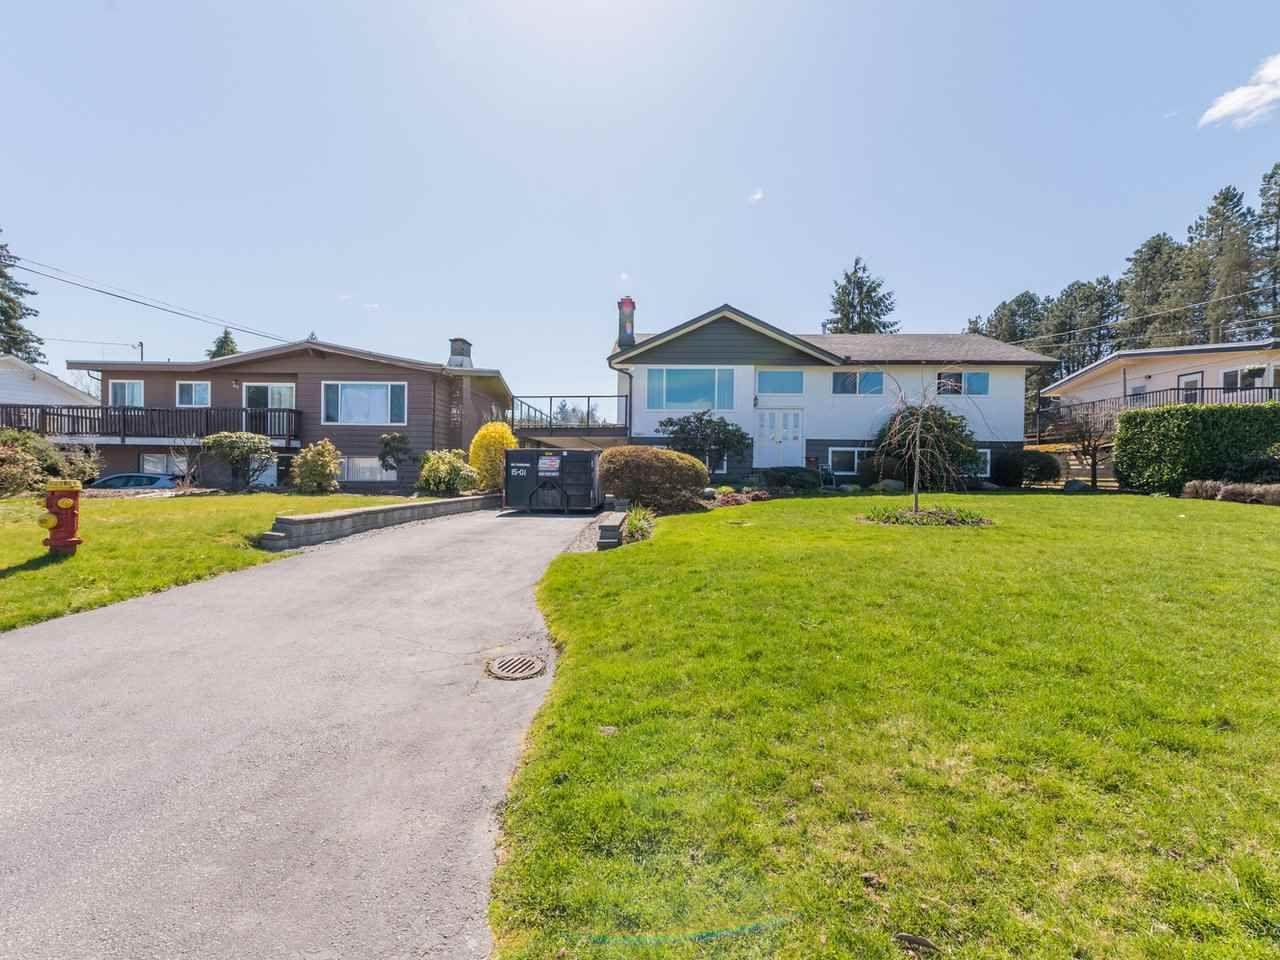 Main Photo: 808 REGAN Avenue in Coquitlam: Coquitlam West House for sale : MLS®# R2563486